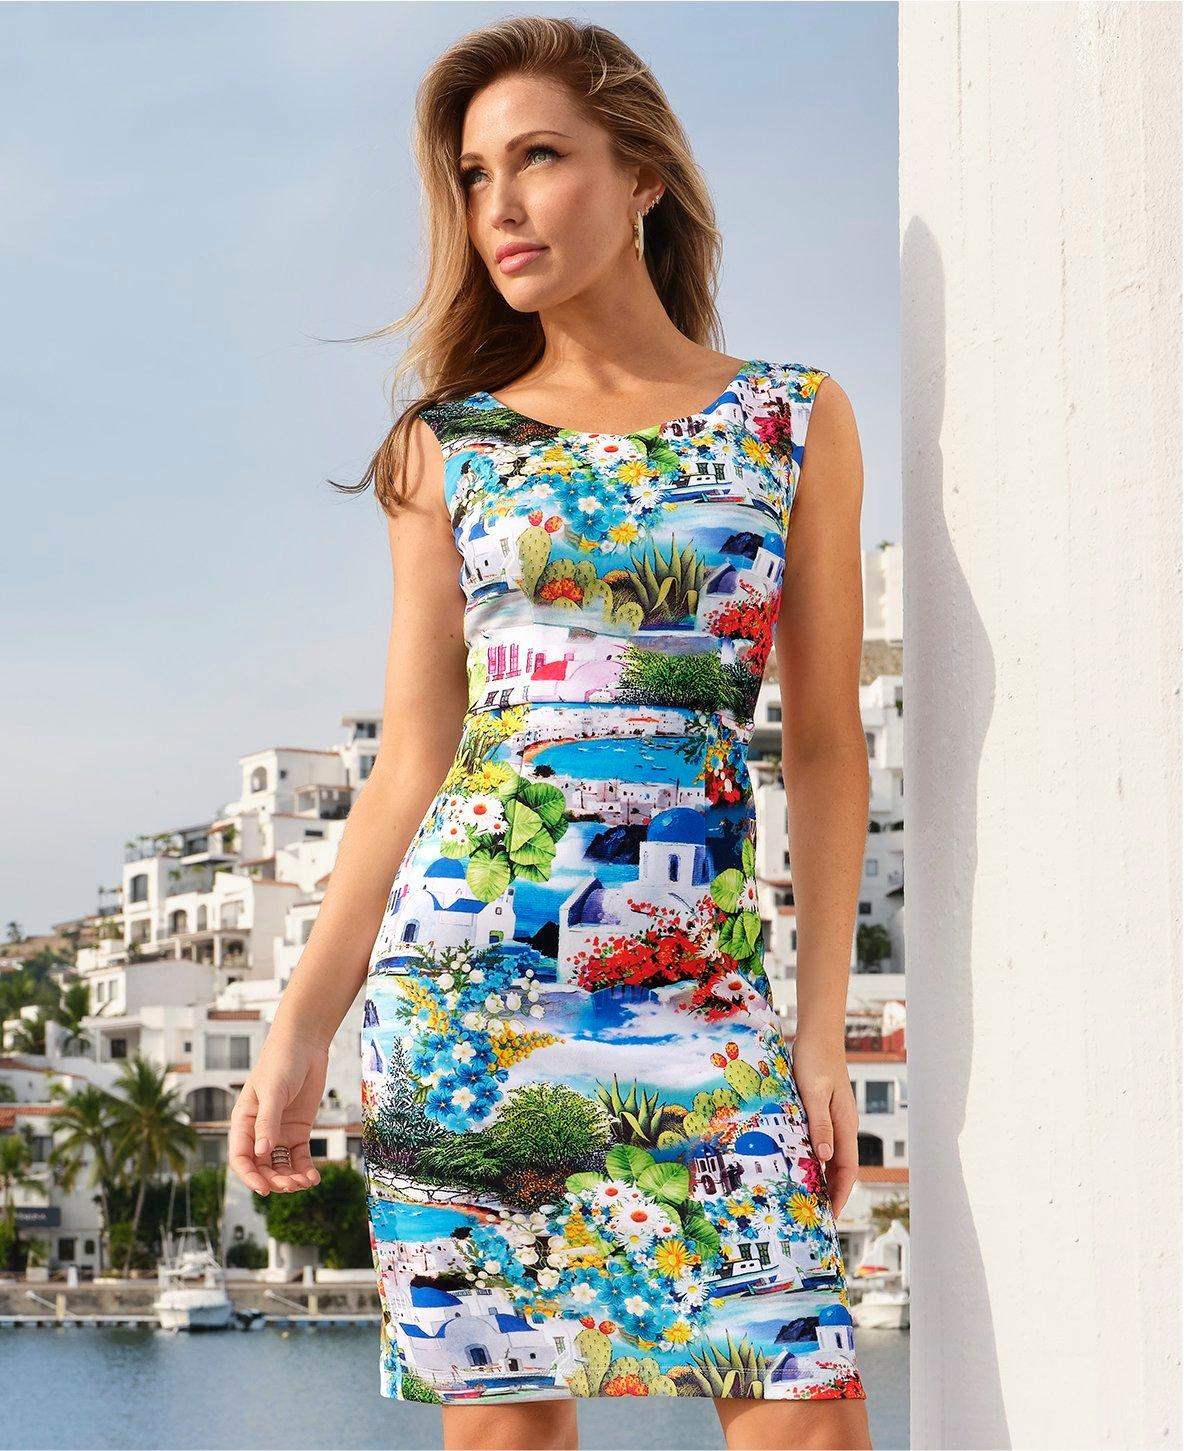 model wearing a multicolored printed sleeveless sheath dress.